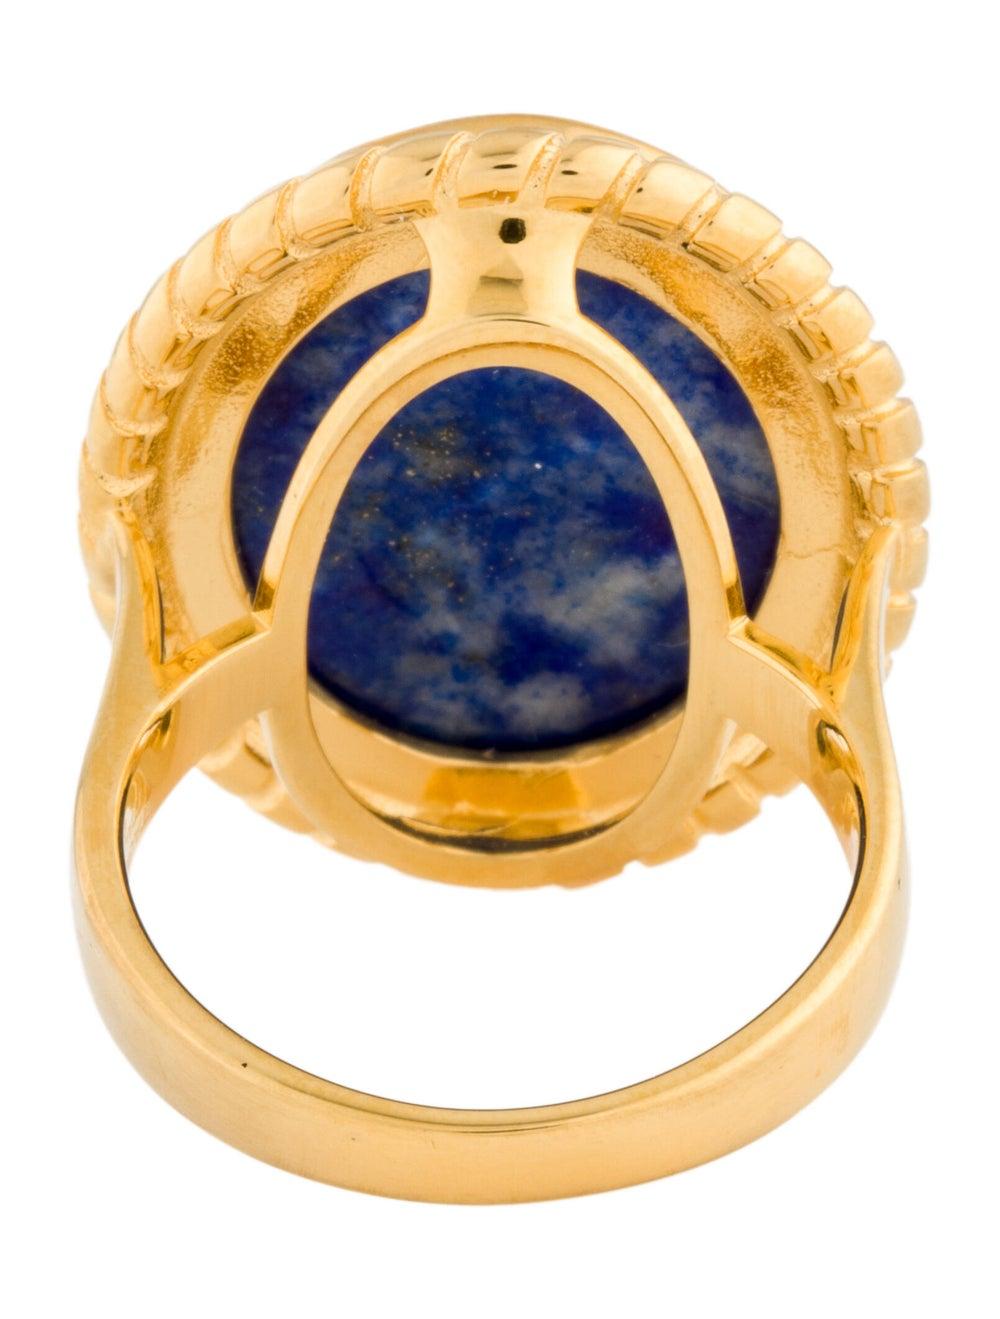 Tagliamonte Lapis Lazuli Cameo Cocktail Ring Gold - image 4